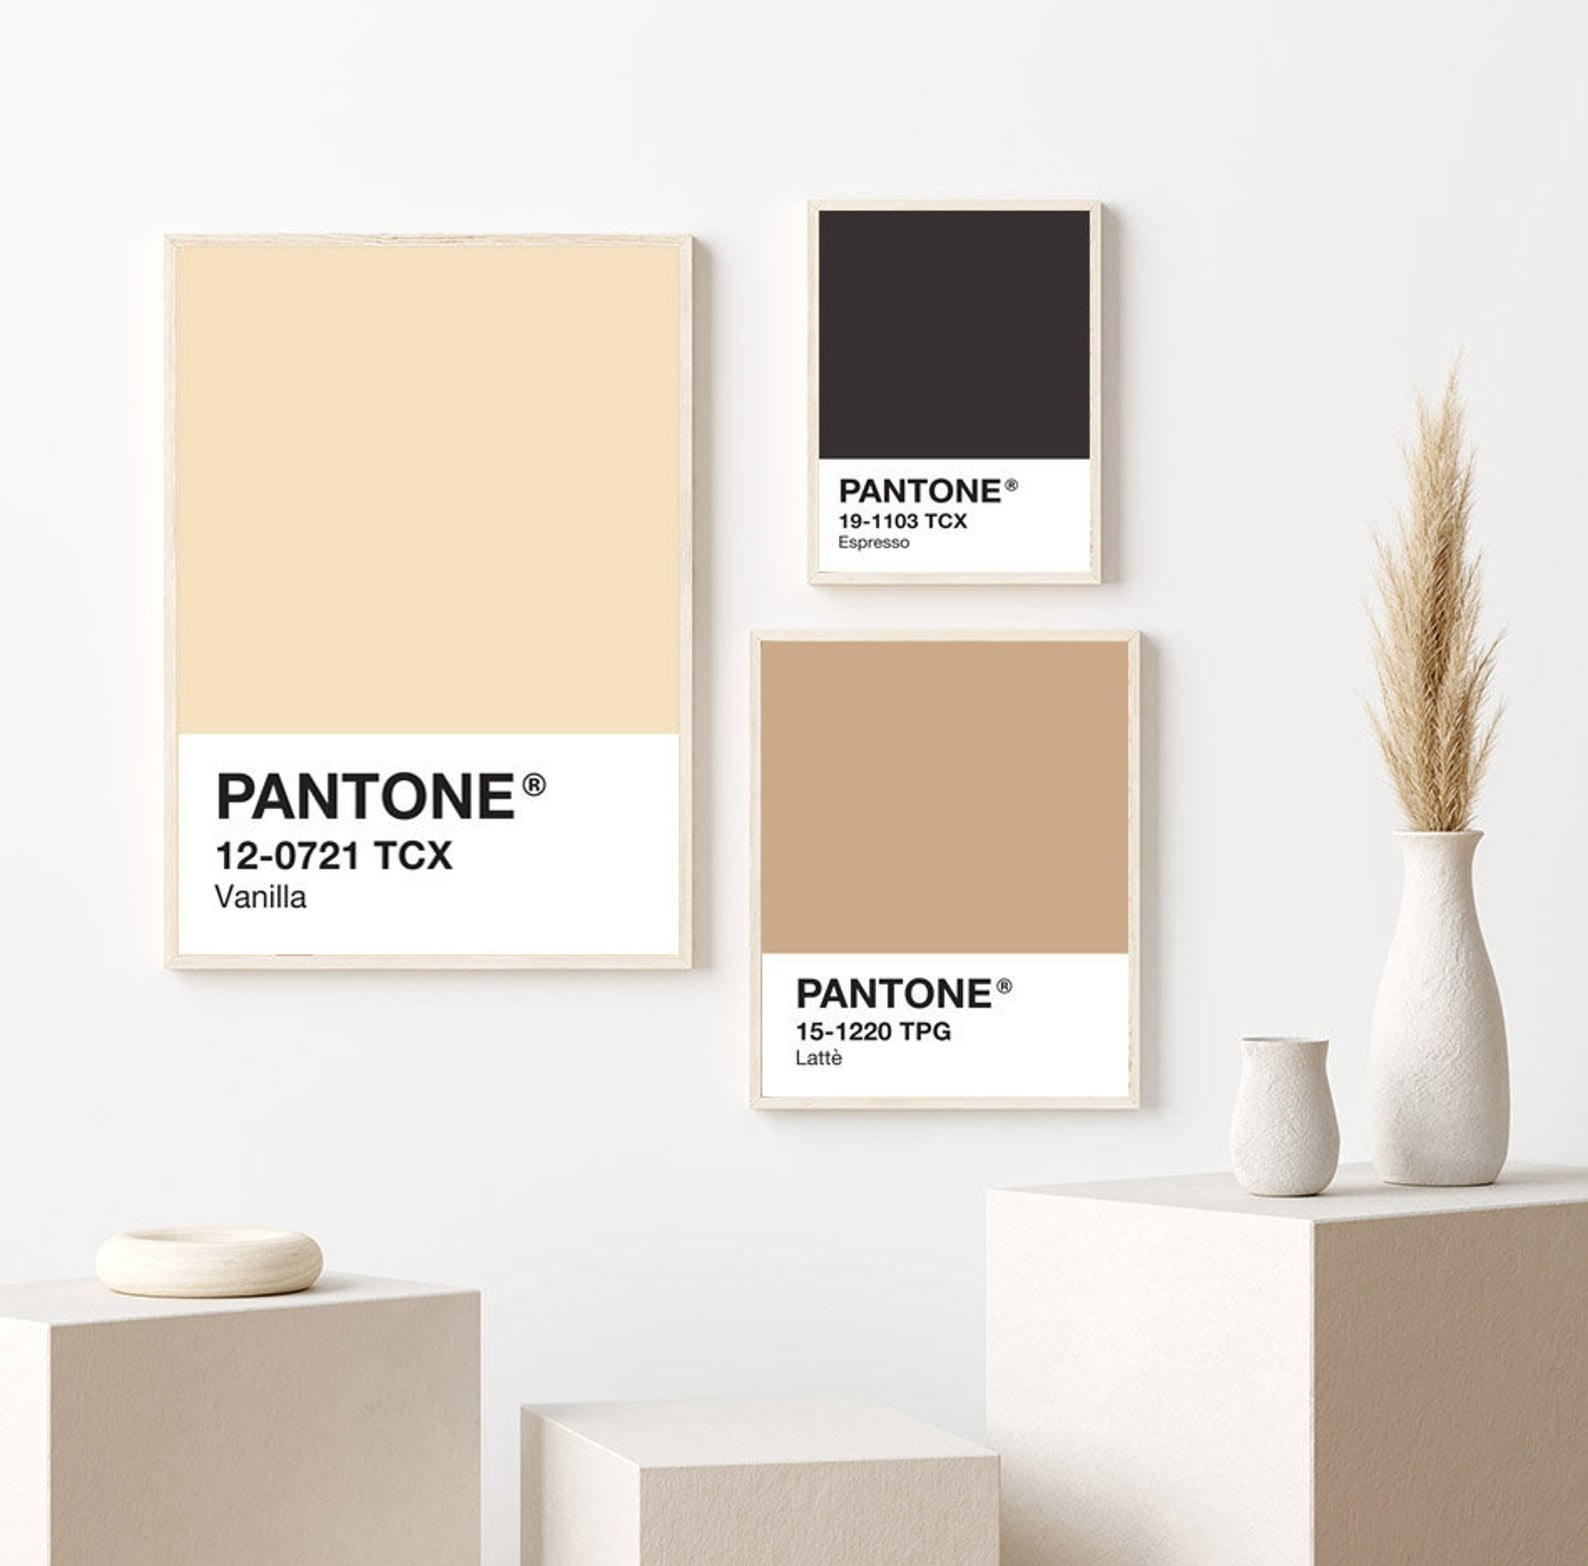 the three prints in Pantone colors vanilla, espresso, and latte